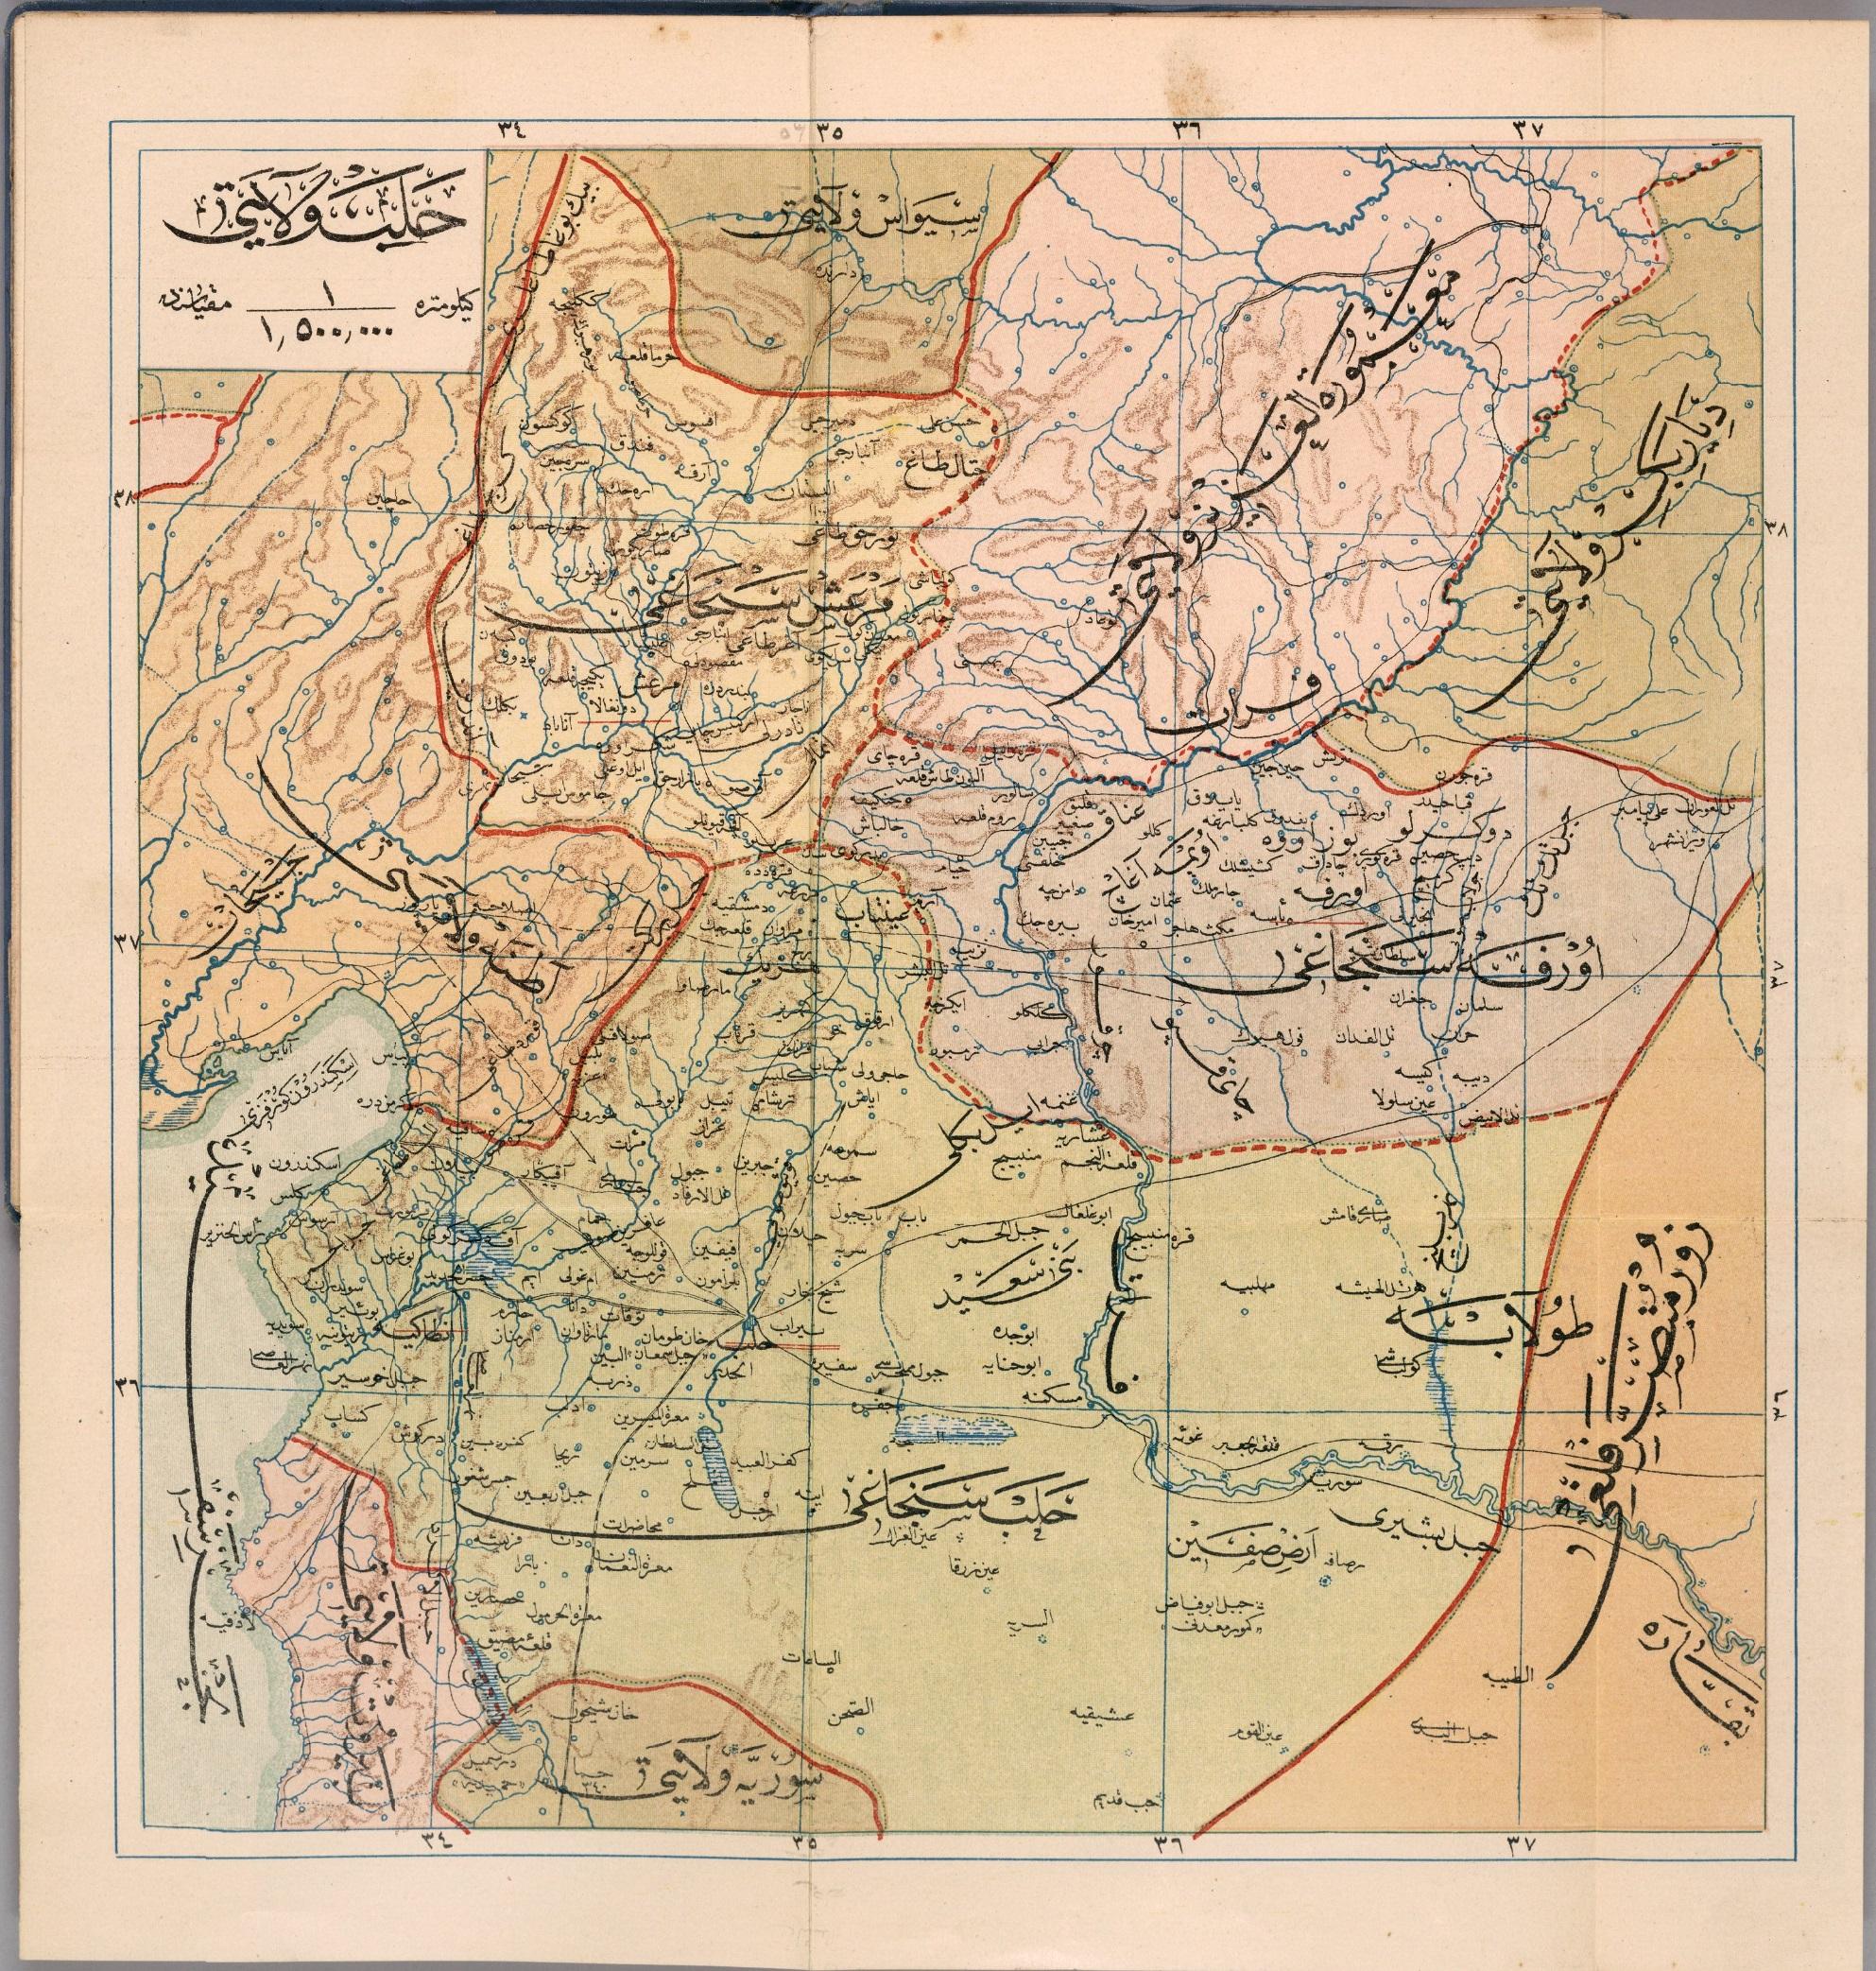 FileAleppo Vilayet Memaliki Mahrusei Shahaneye Mahsus - China historical map 1890 1907